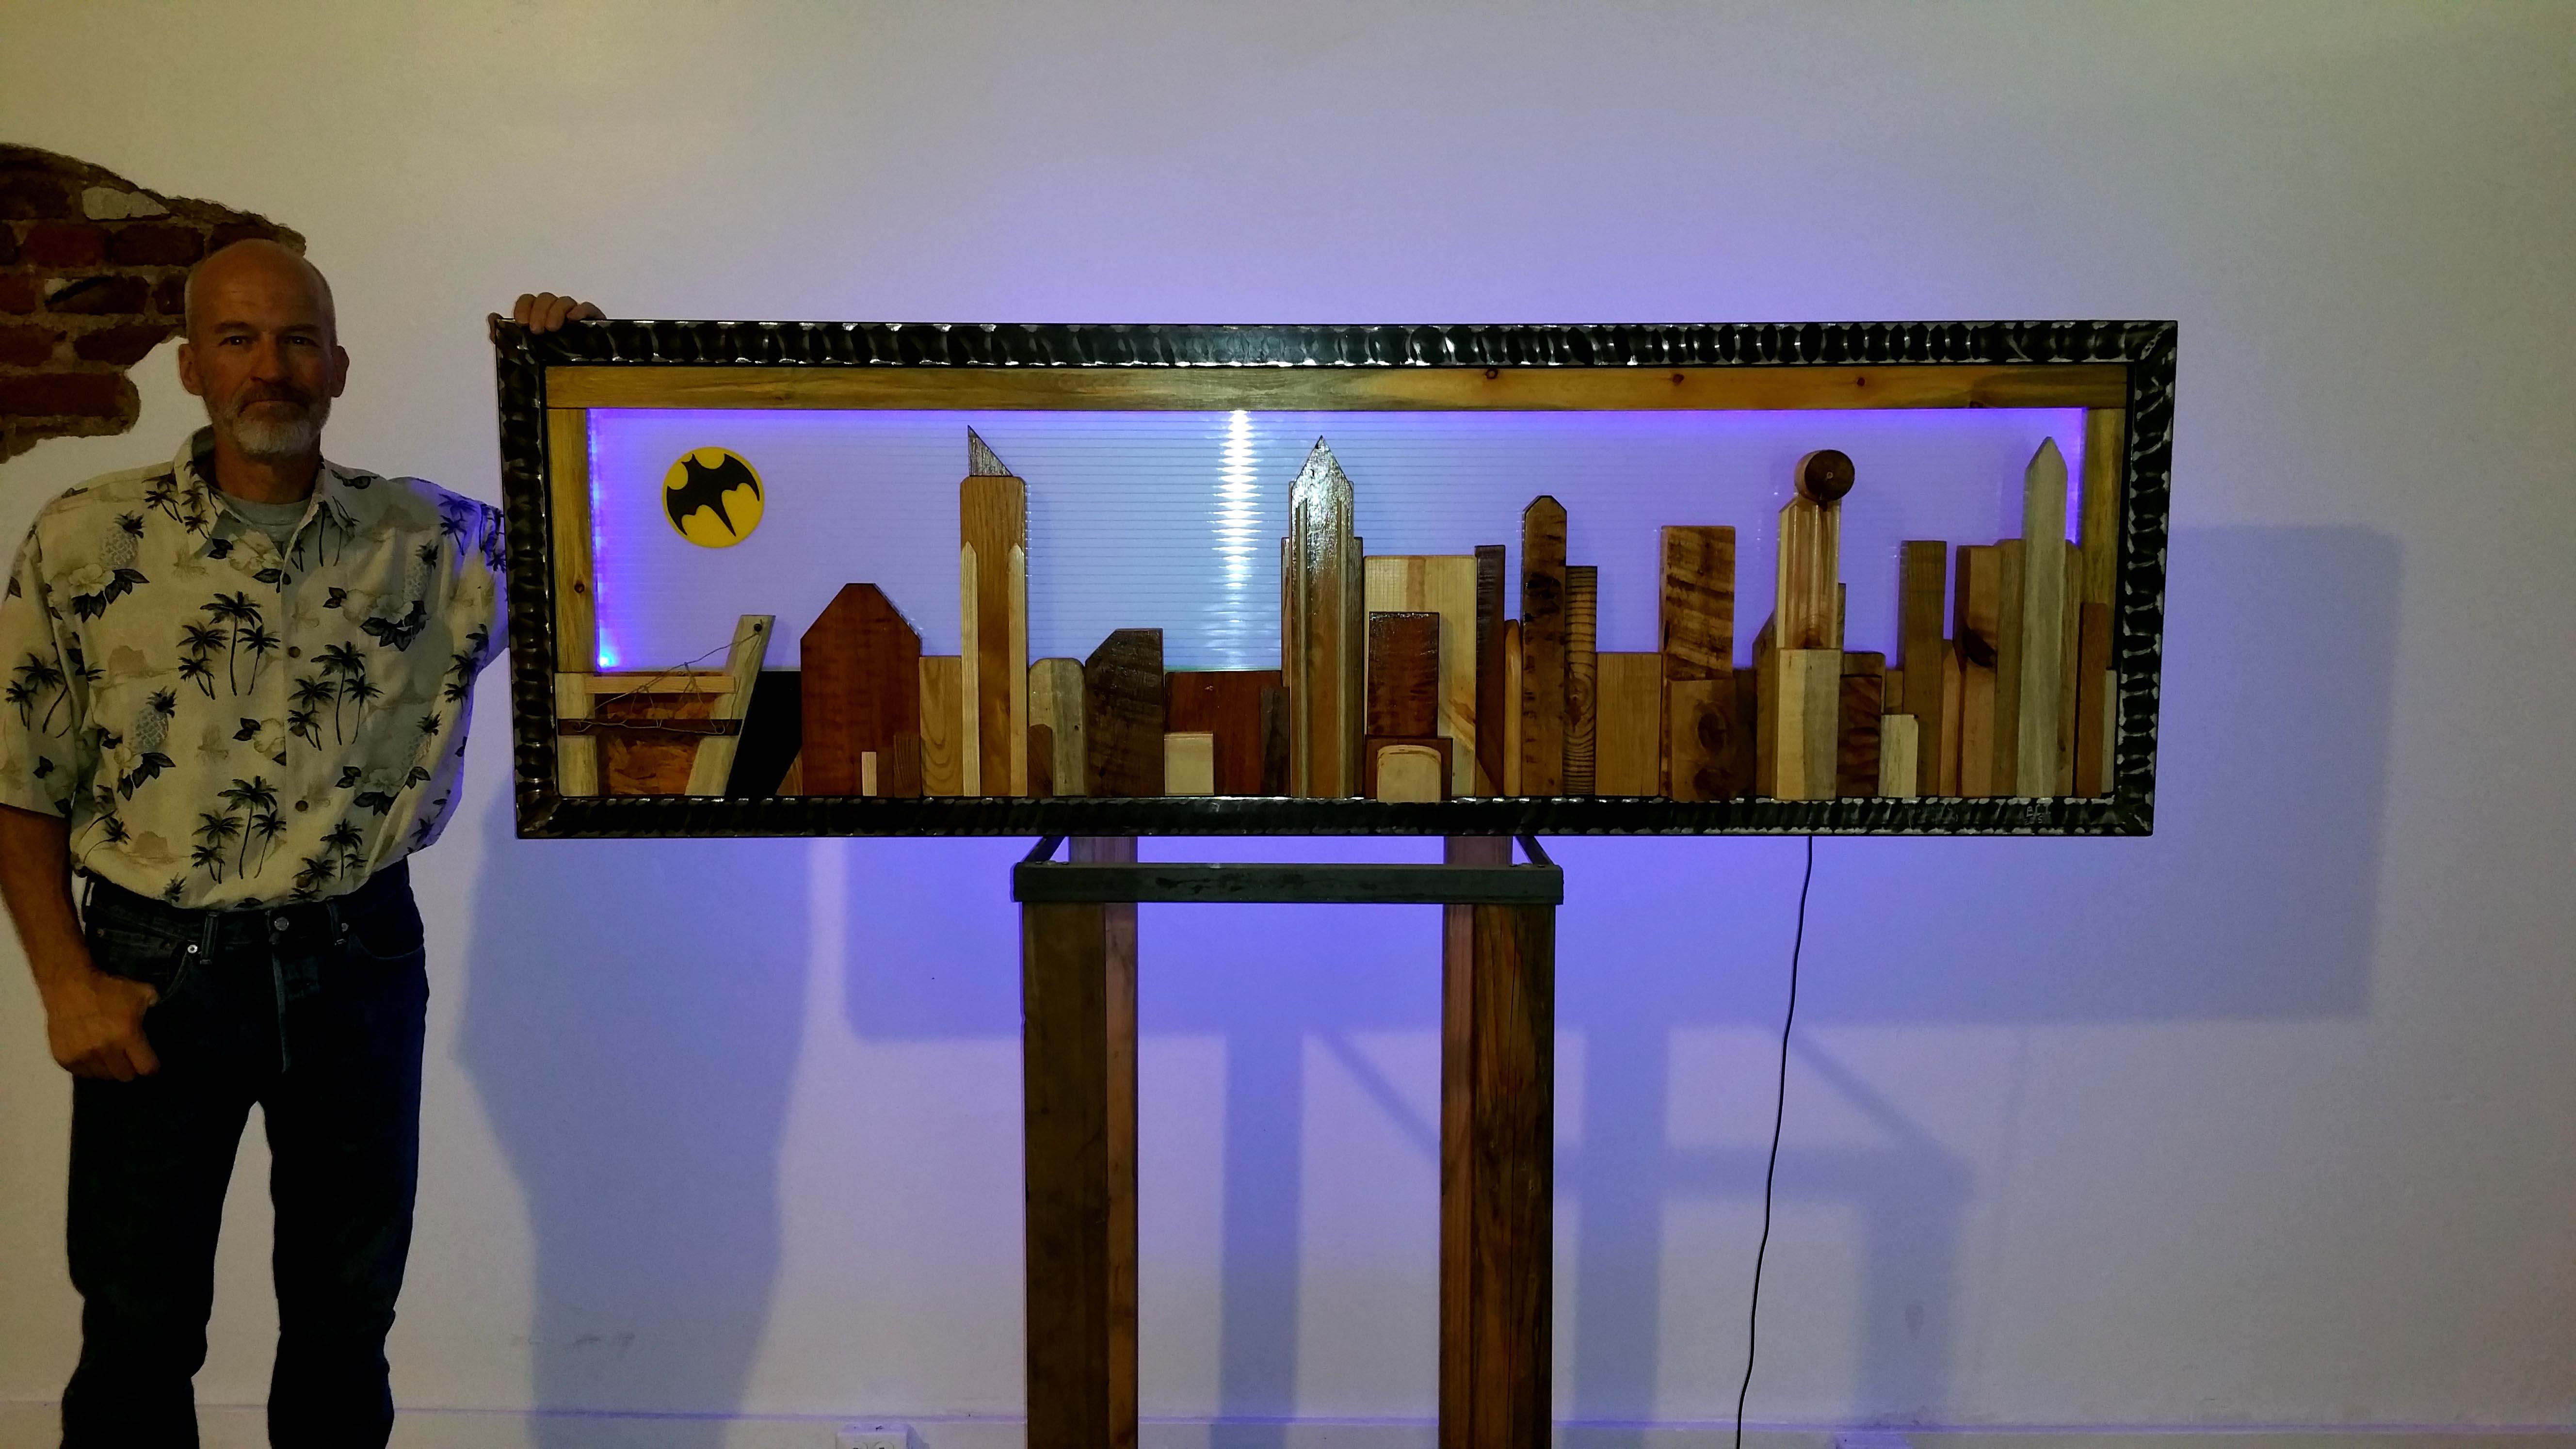 Gotham City Sculpture